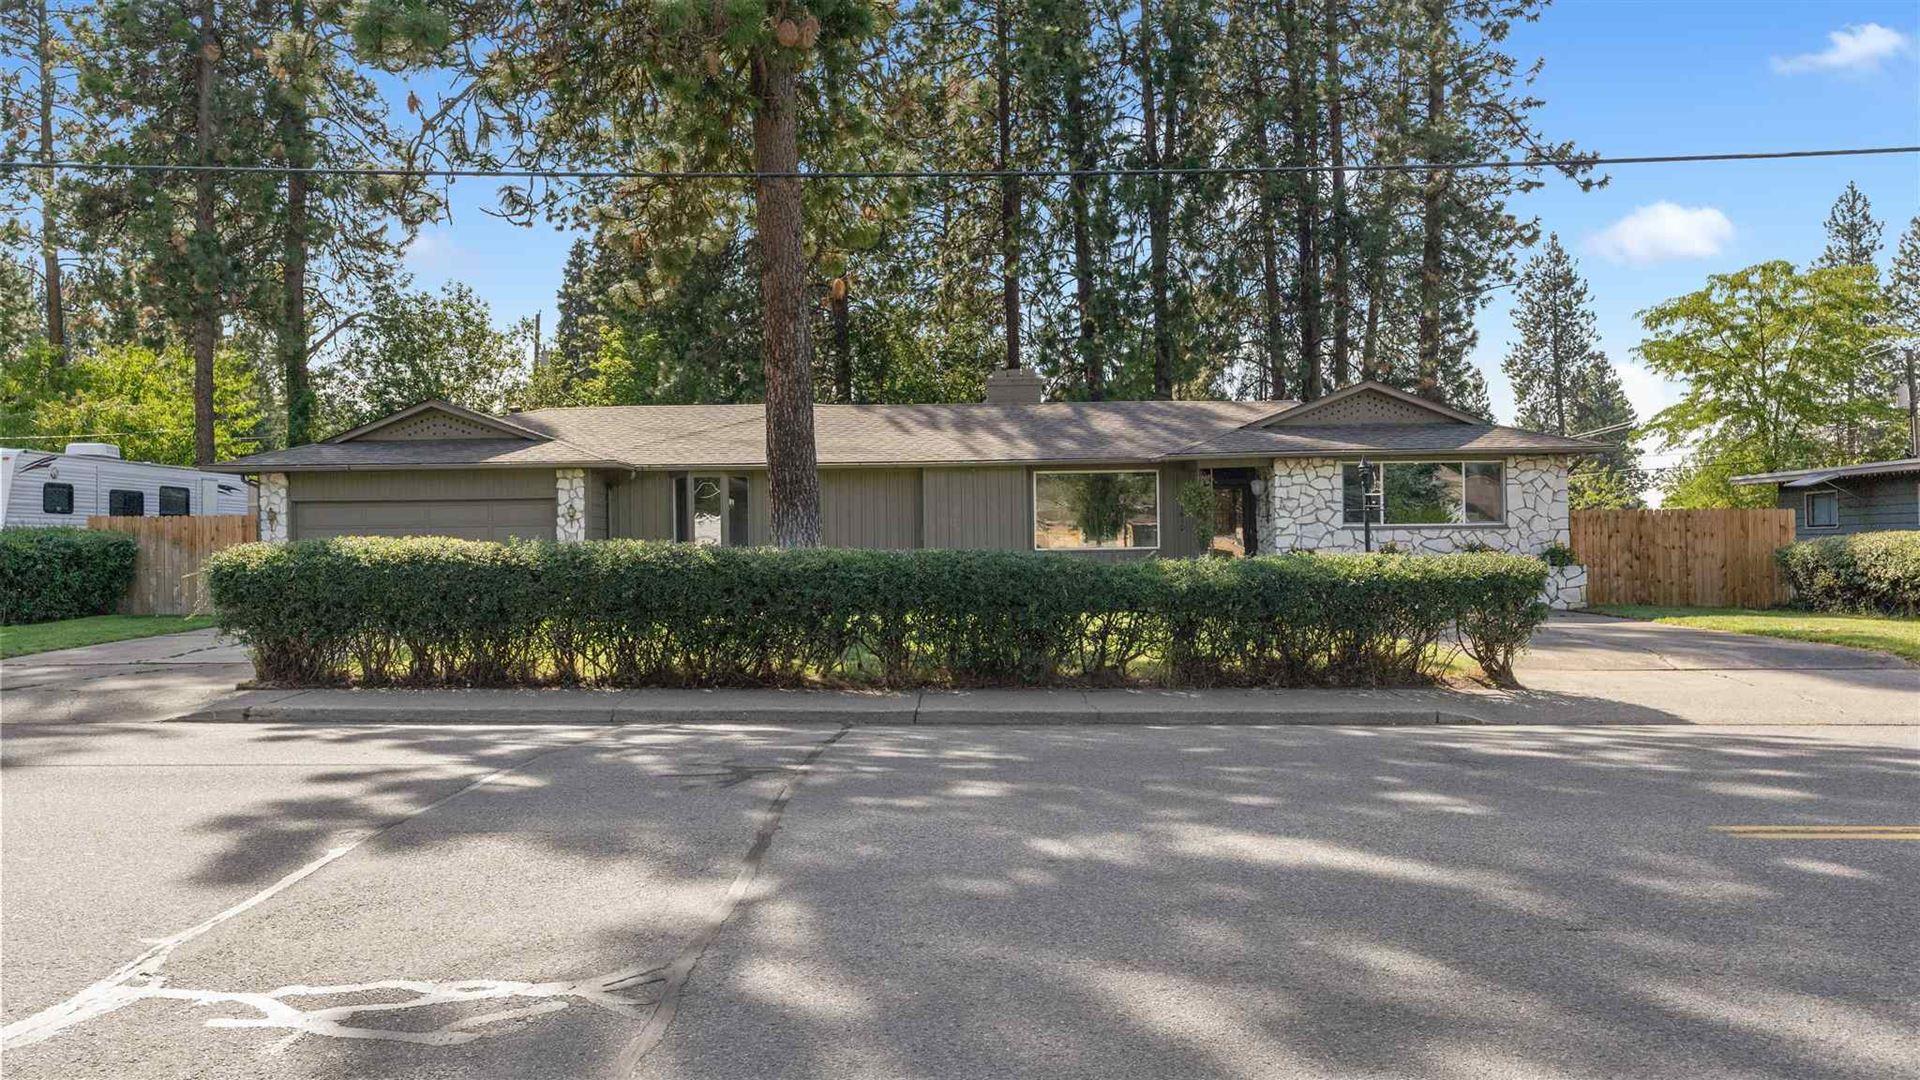 1610 S McDonald Rd, Spokane Valley, WA 99216 - #: 202120689